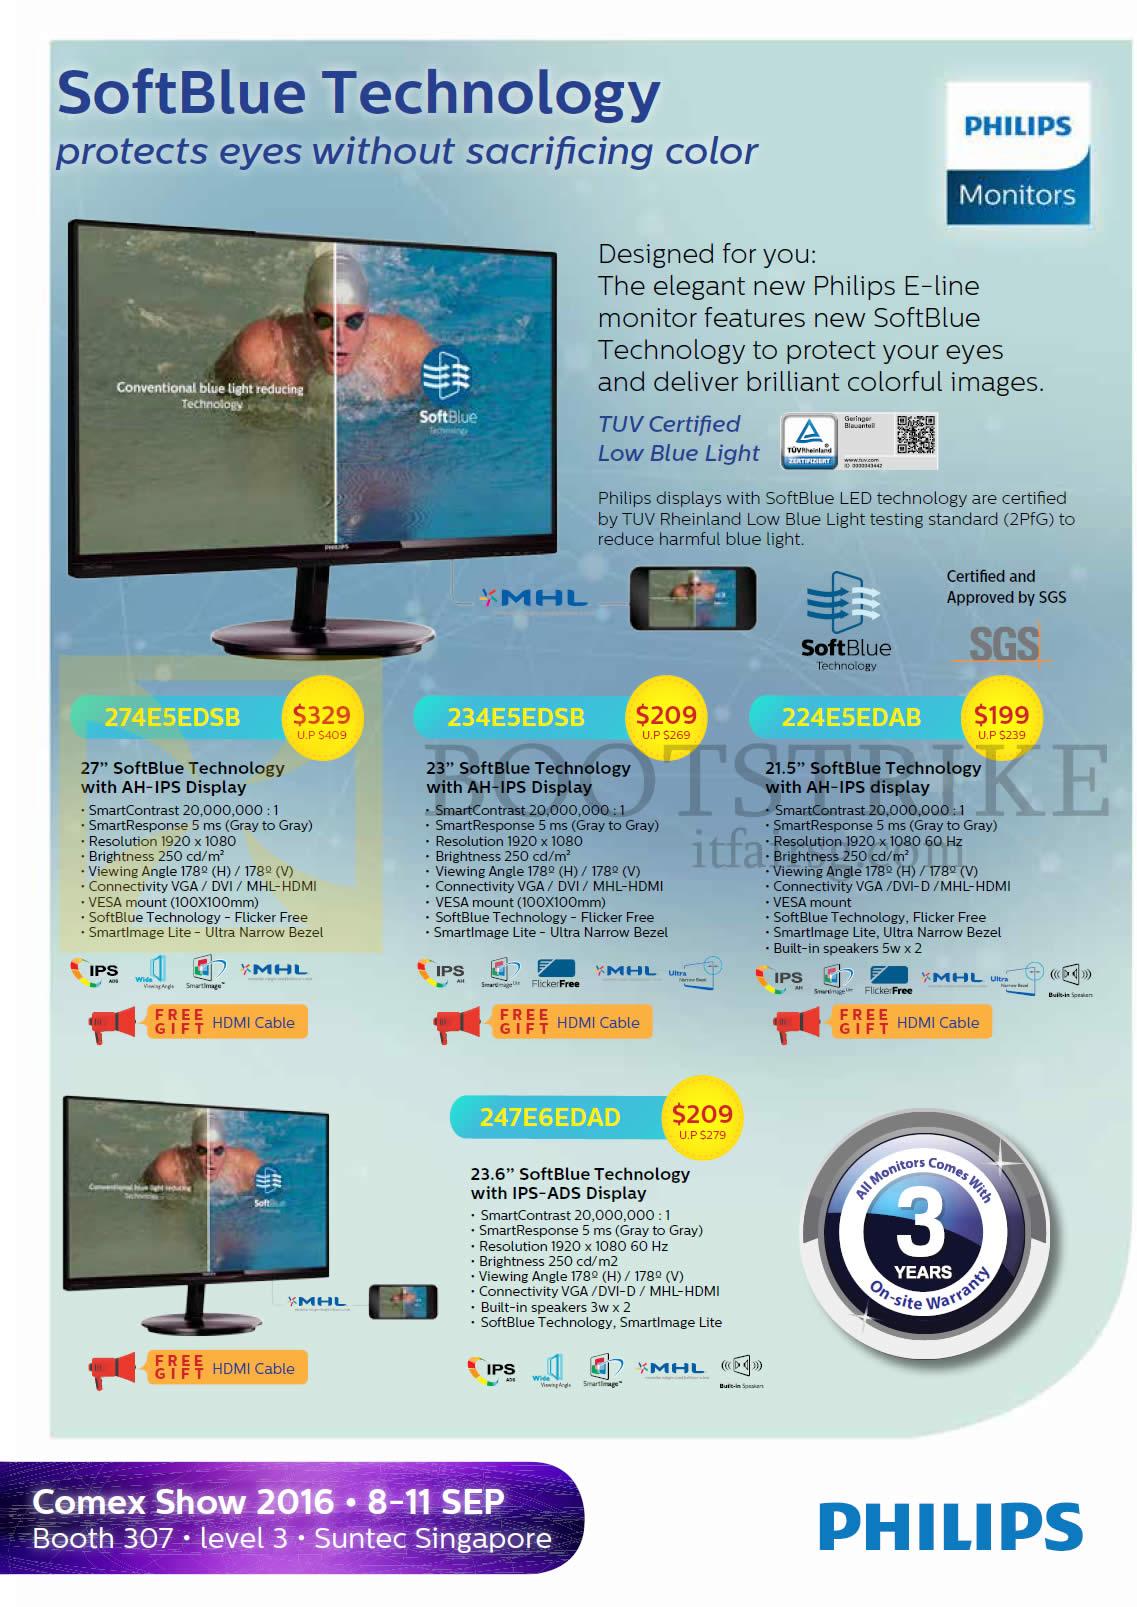 COMEX 2016 price list image brochure of Philips Newstead Monitors AH-IPS IPS-ADS 274E5EDSB, 234E5EDSB, 224E5EDAB, 247E6EDAD